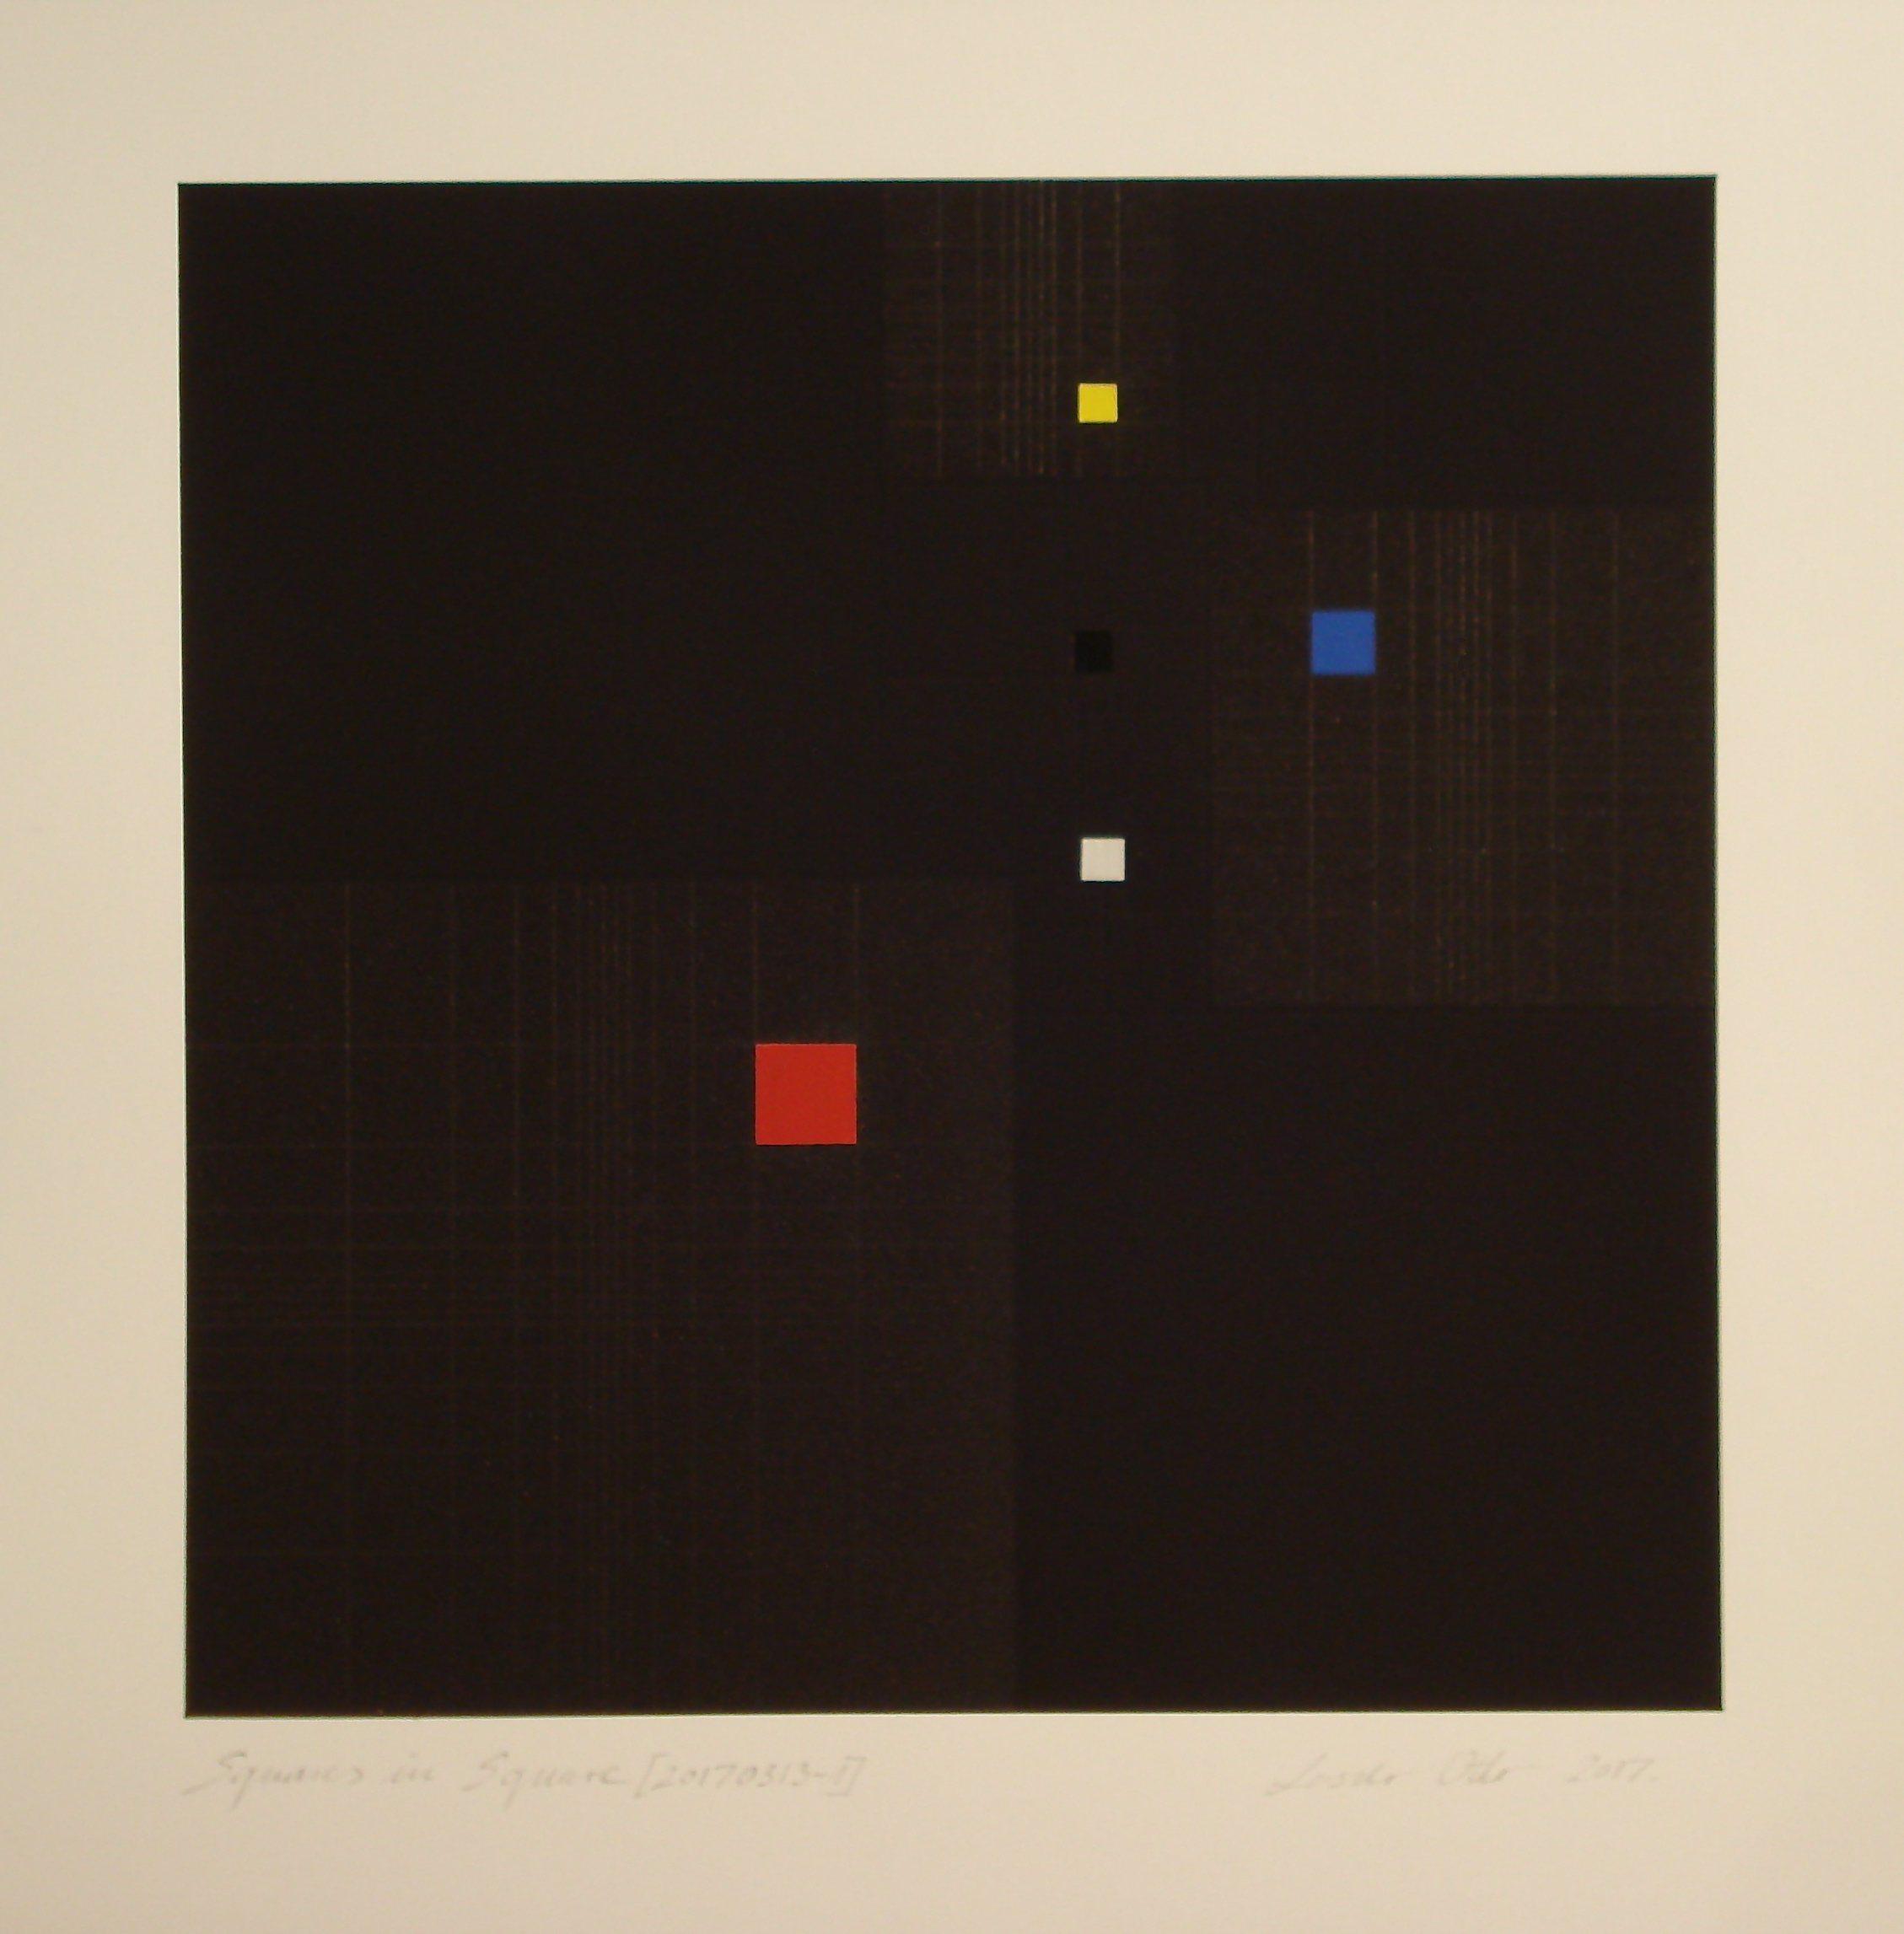 Squares in Square + Fibonacci-sequence [20170313-2], 2017, pigment, acrylic on paper, 14 x 13 13/16 in. [35.5x35cm]